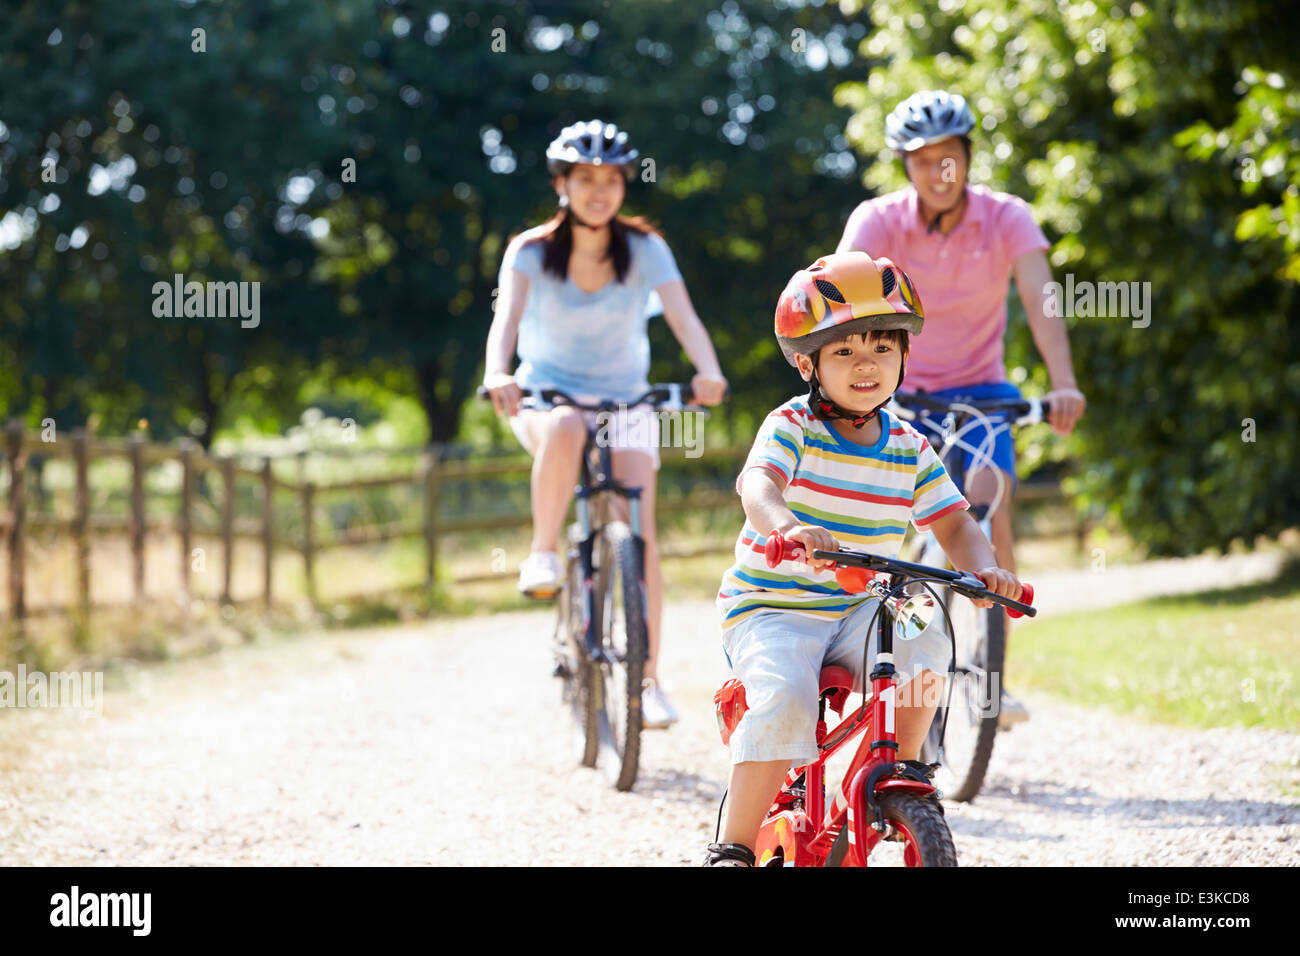 Asian Family sur Balade en vélo dans la campagne environnante Photo Stock